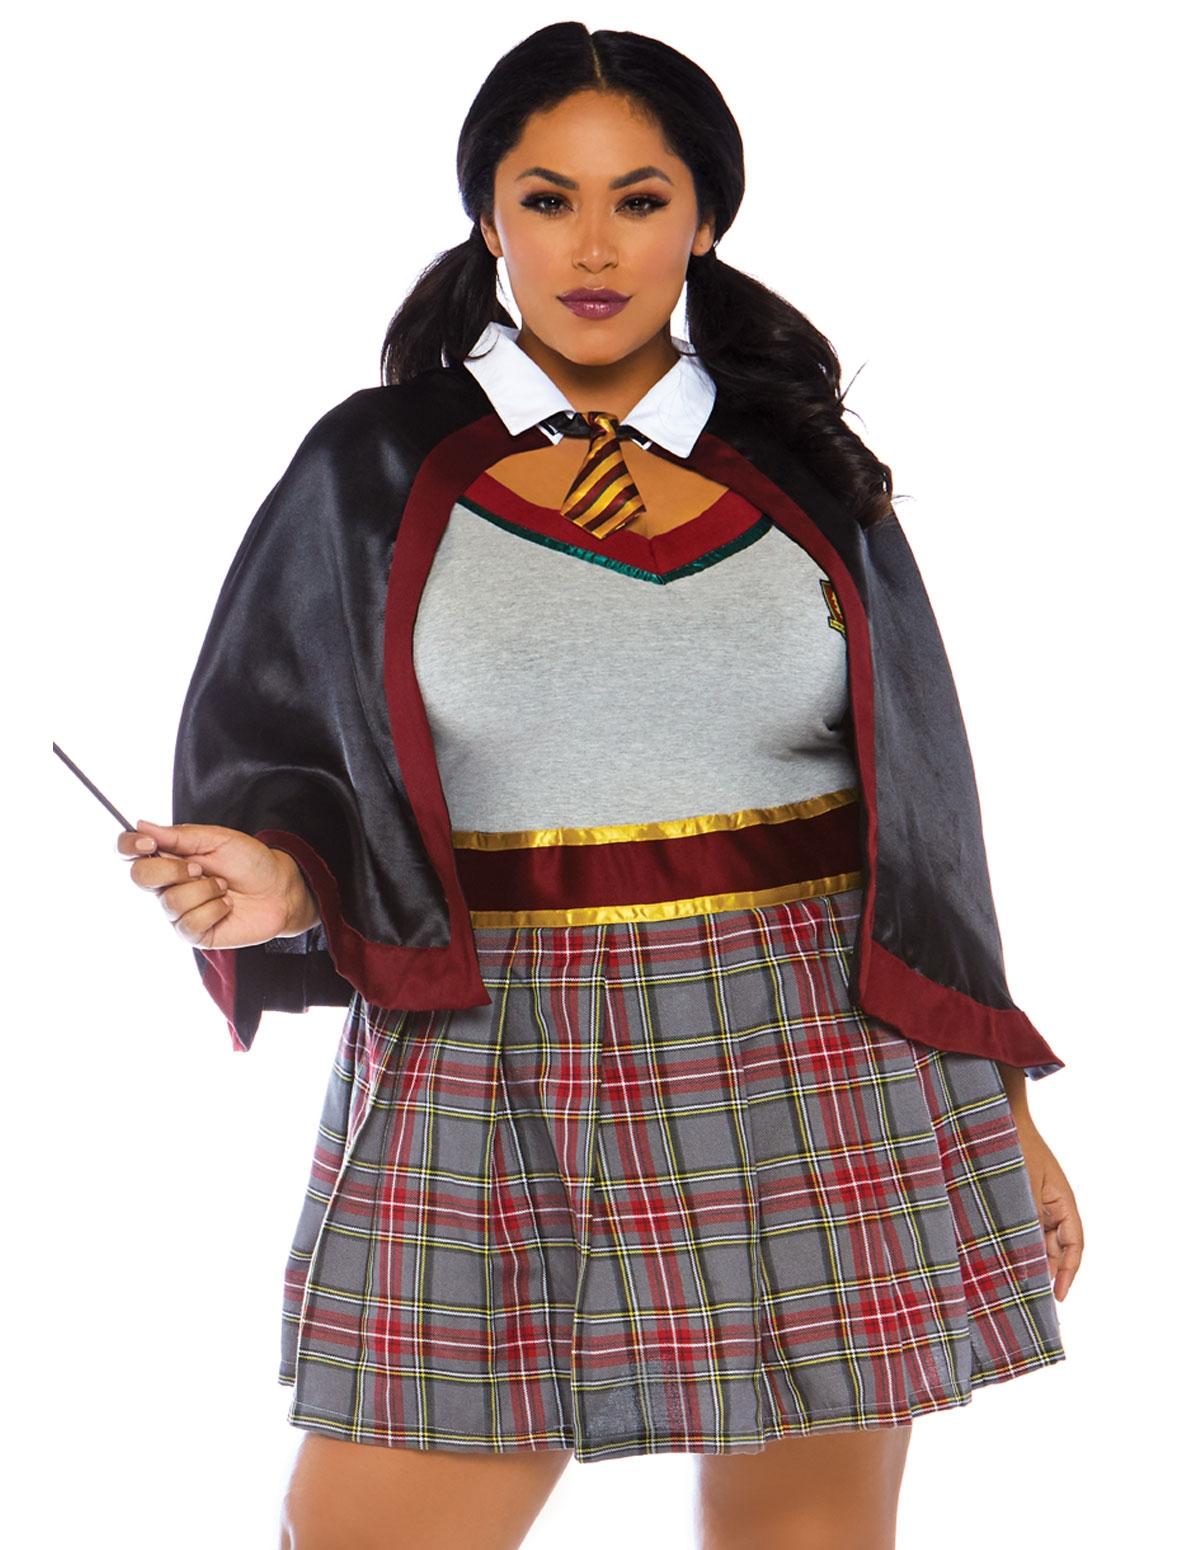 2Pc. Spellbinding Plus Size School Girl